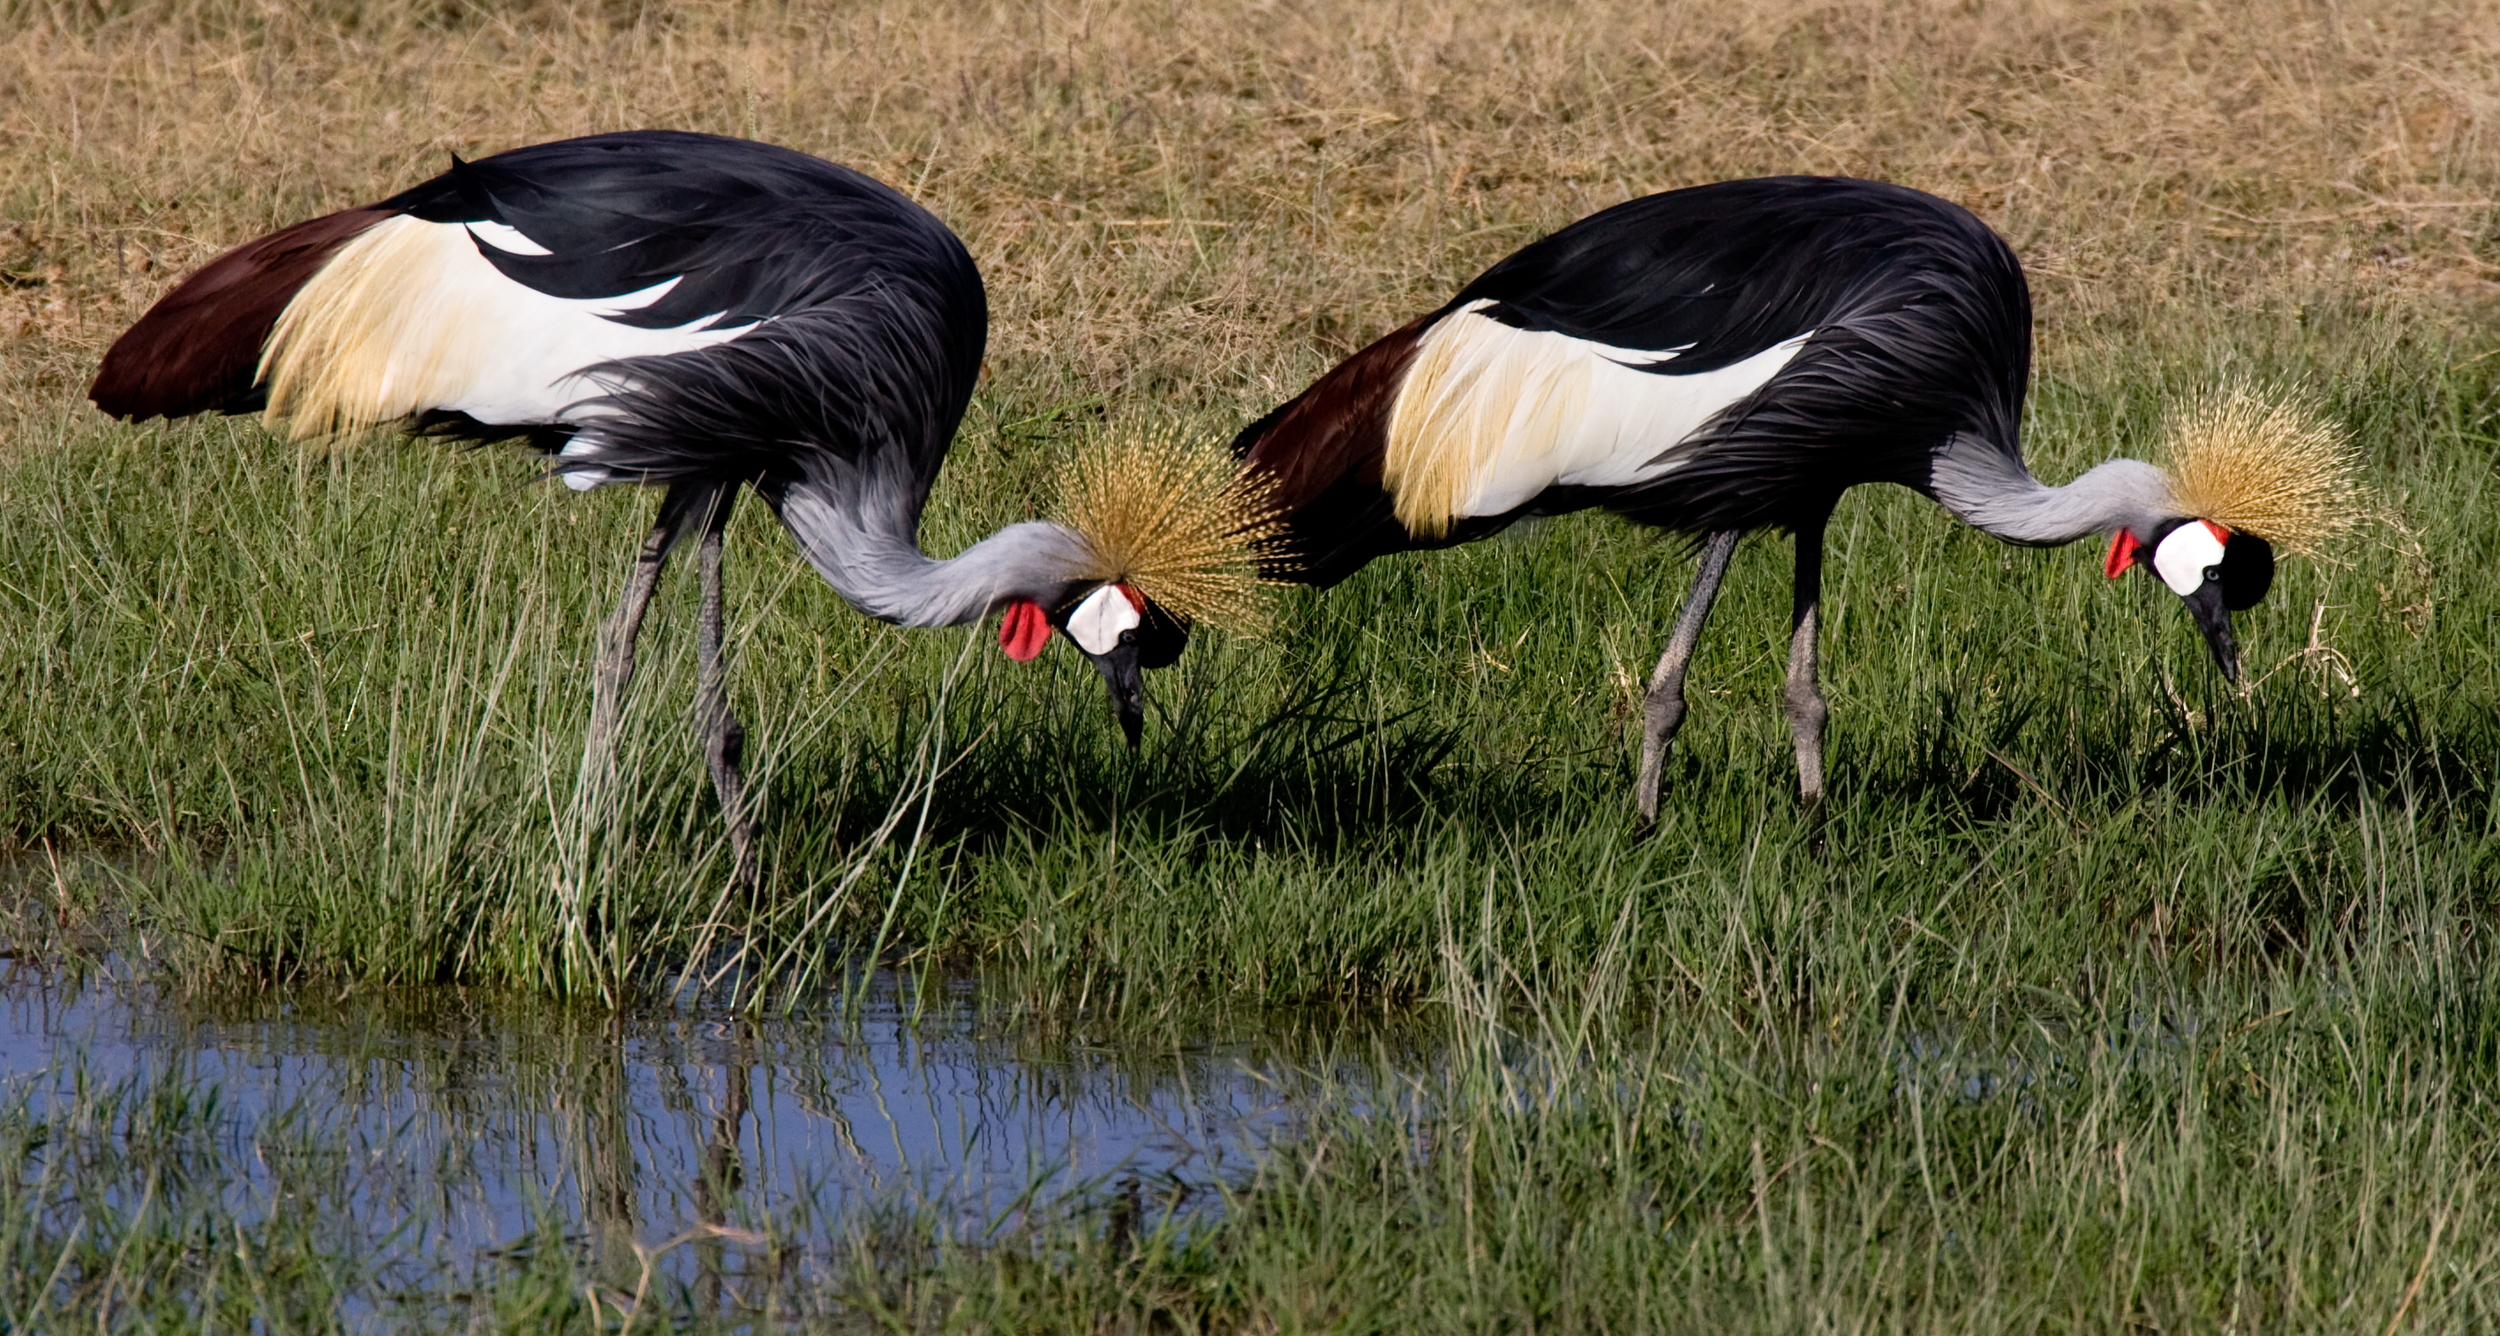 Rick Sammon's Birds003.jpg